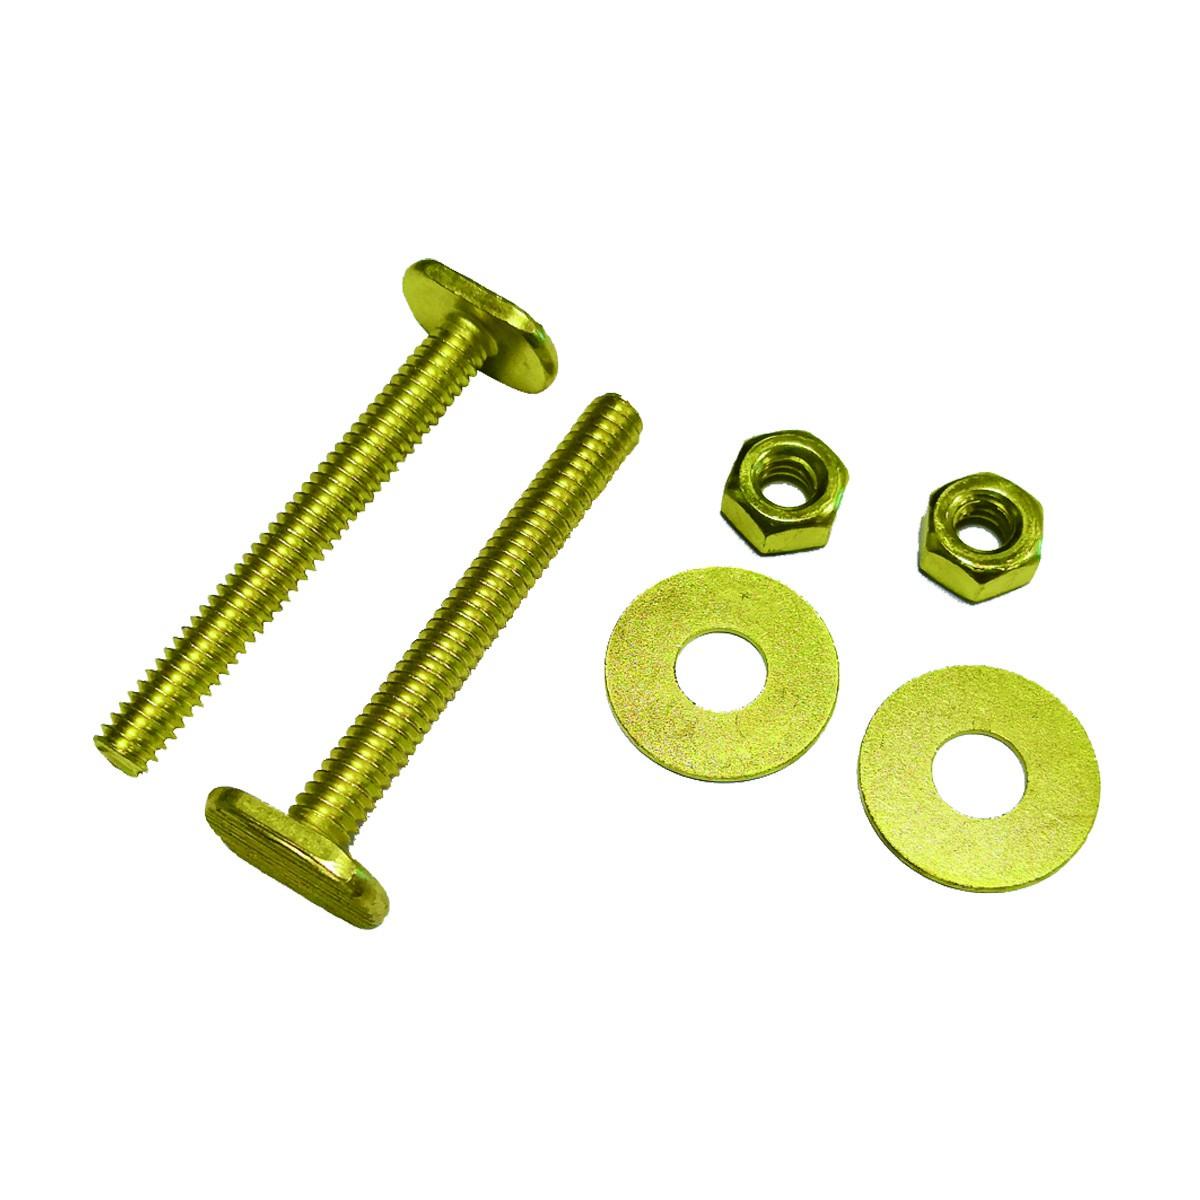 Brass Toilet Flange Wax Ring Kit